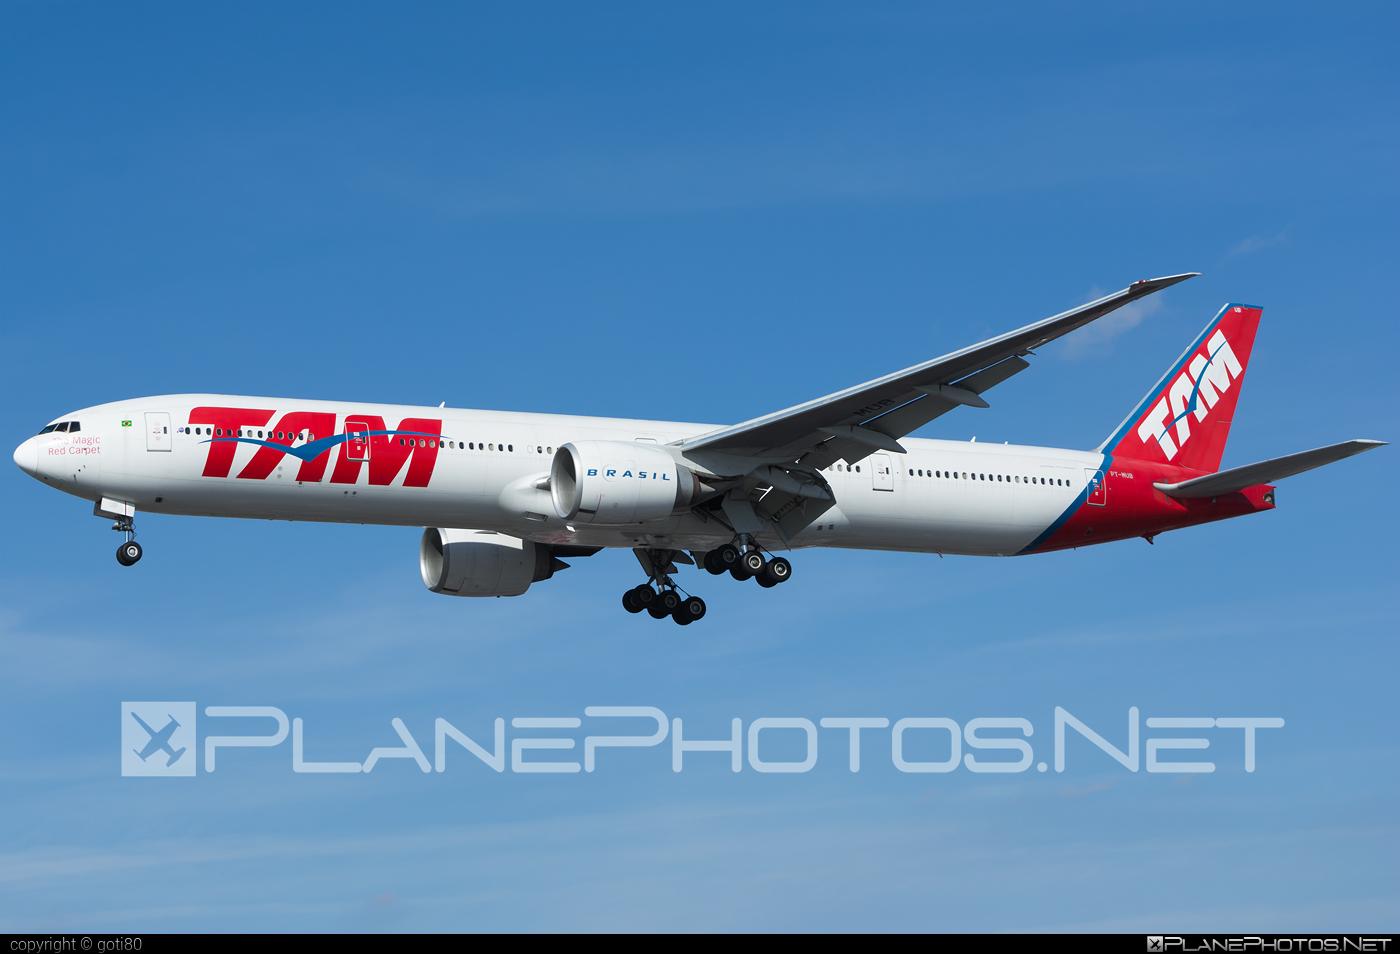 Boeing 777-300ER - PT-MUB operated by TAM Linhas Aéreas #b777 #b777er #boeing #boeing777 #tam #tamairlines #tamlinhasaereas #tripleseven